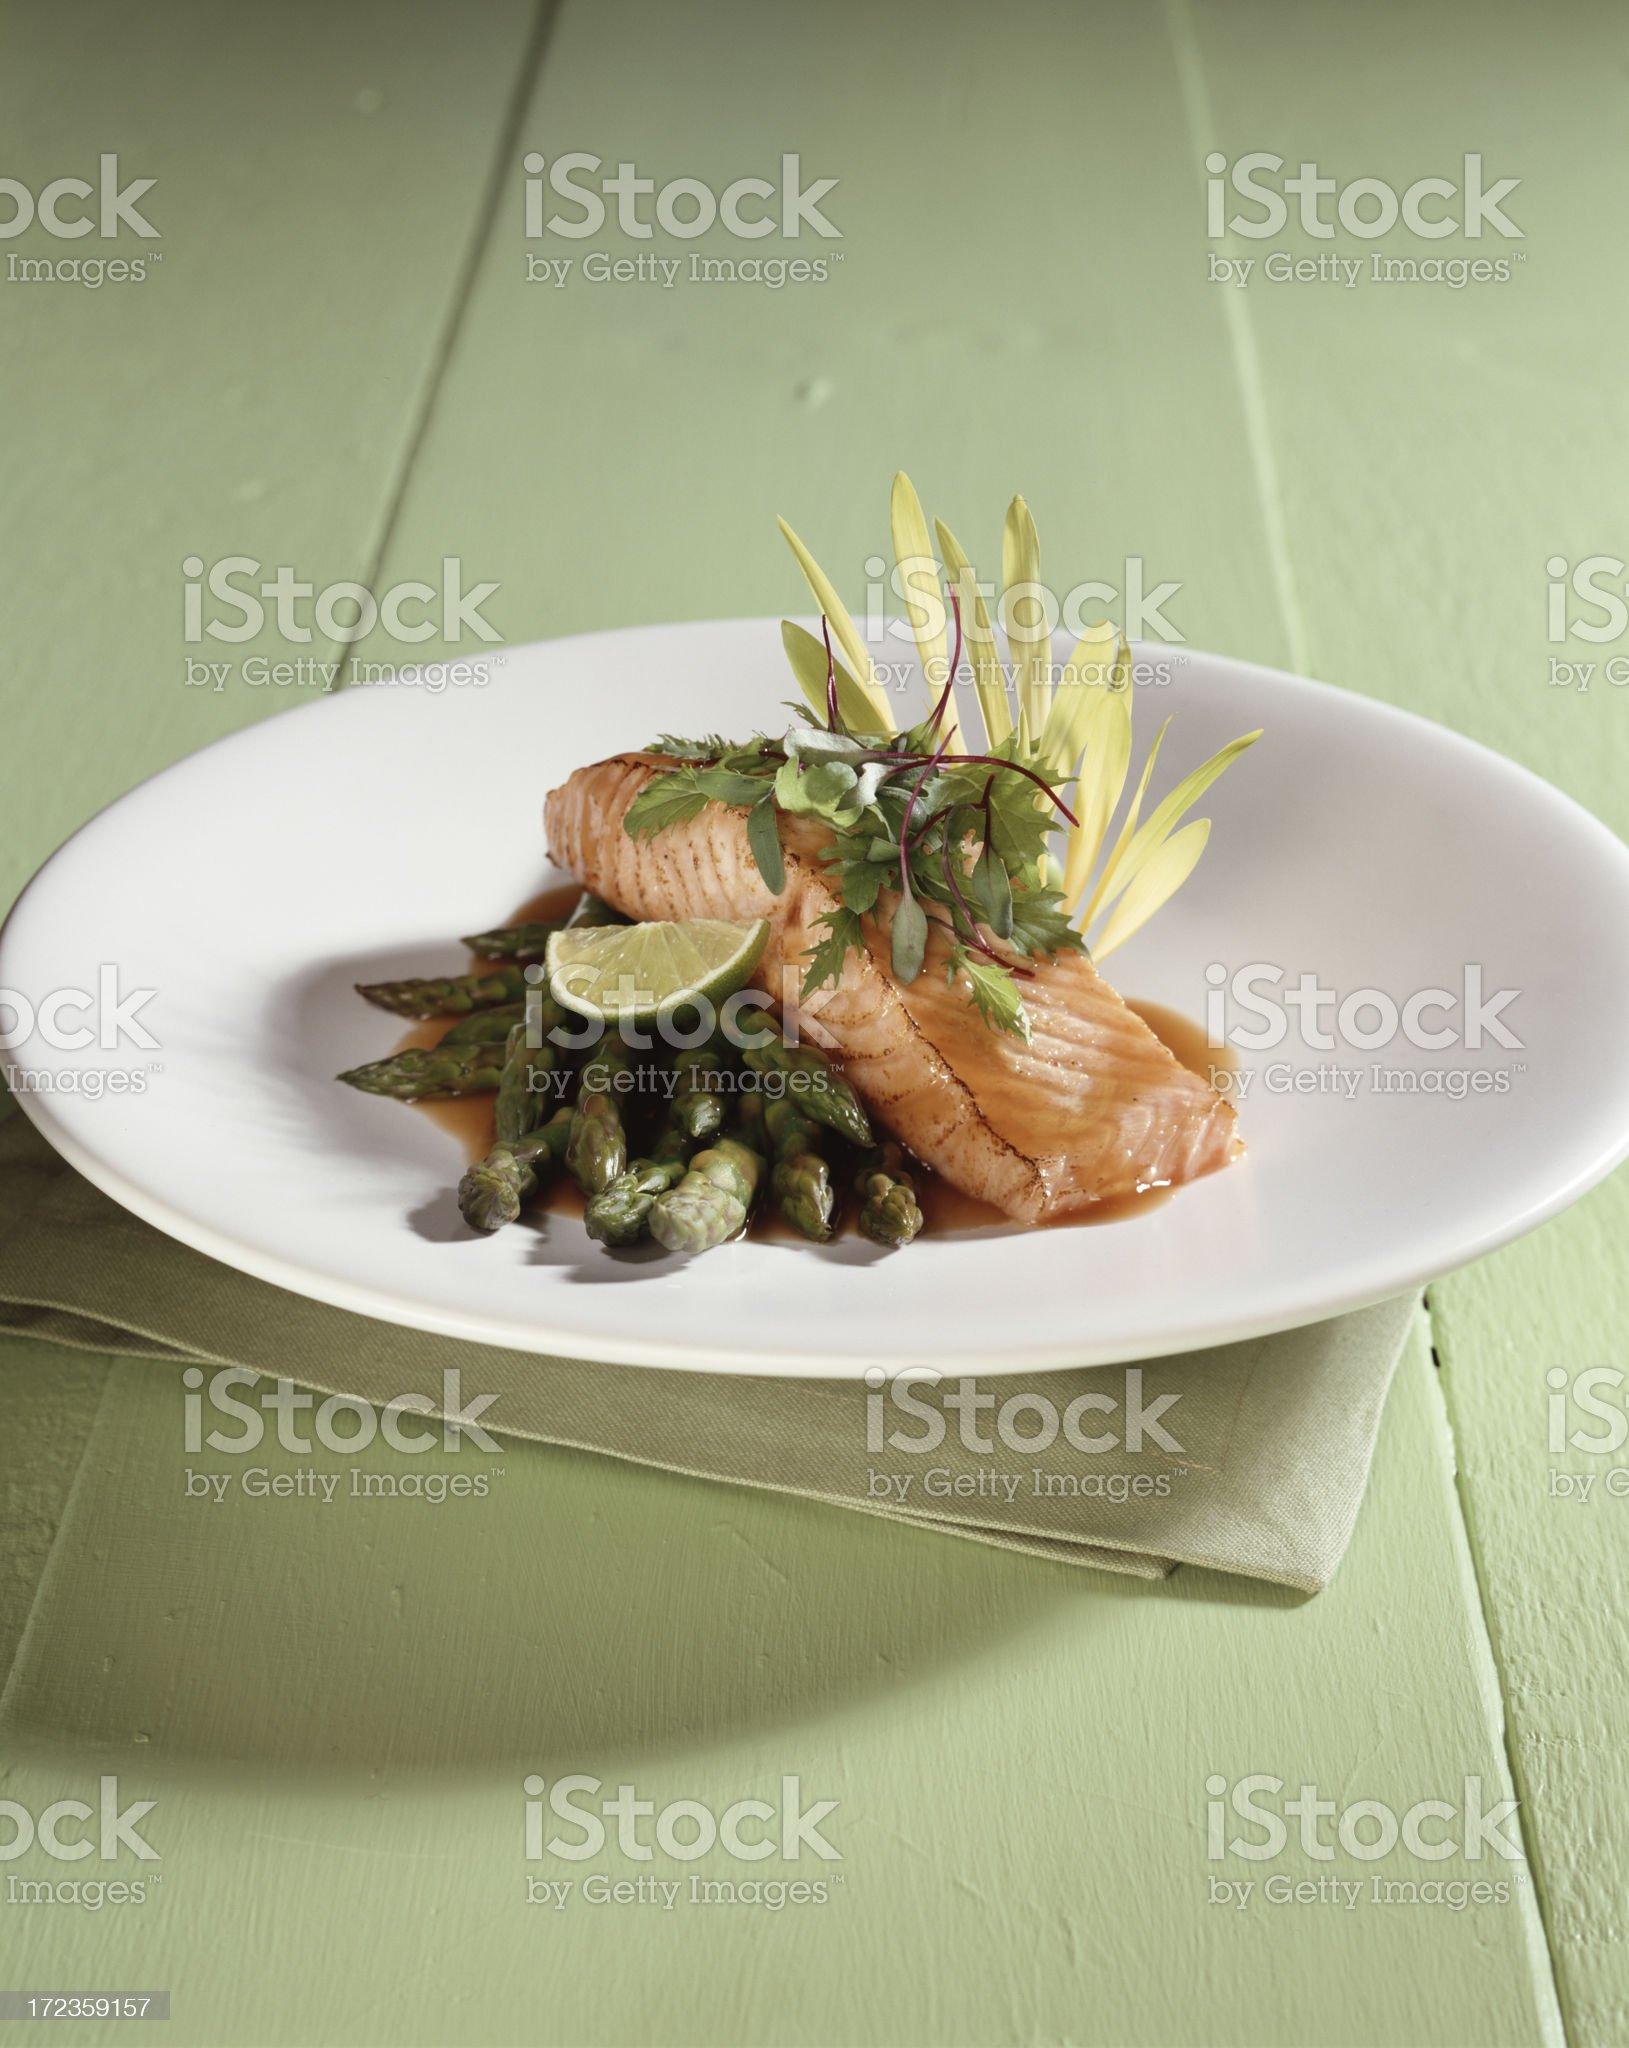 Salmon with Asparagus royalty-free stock photo